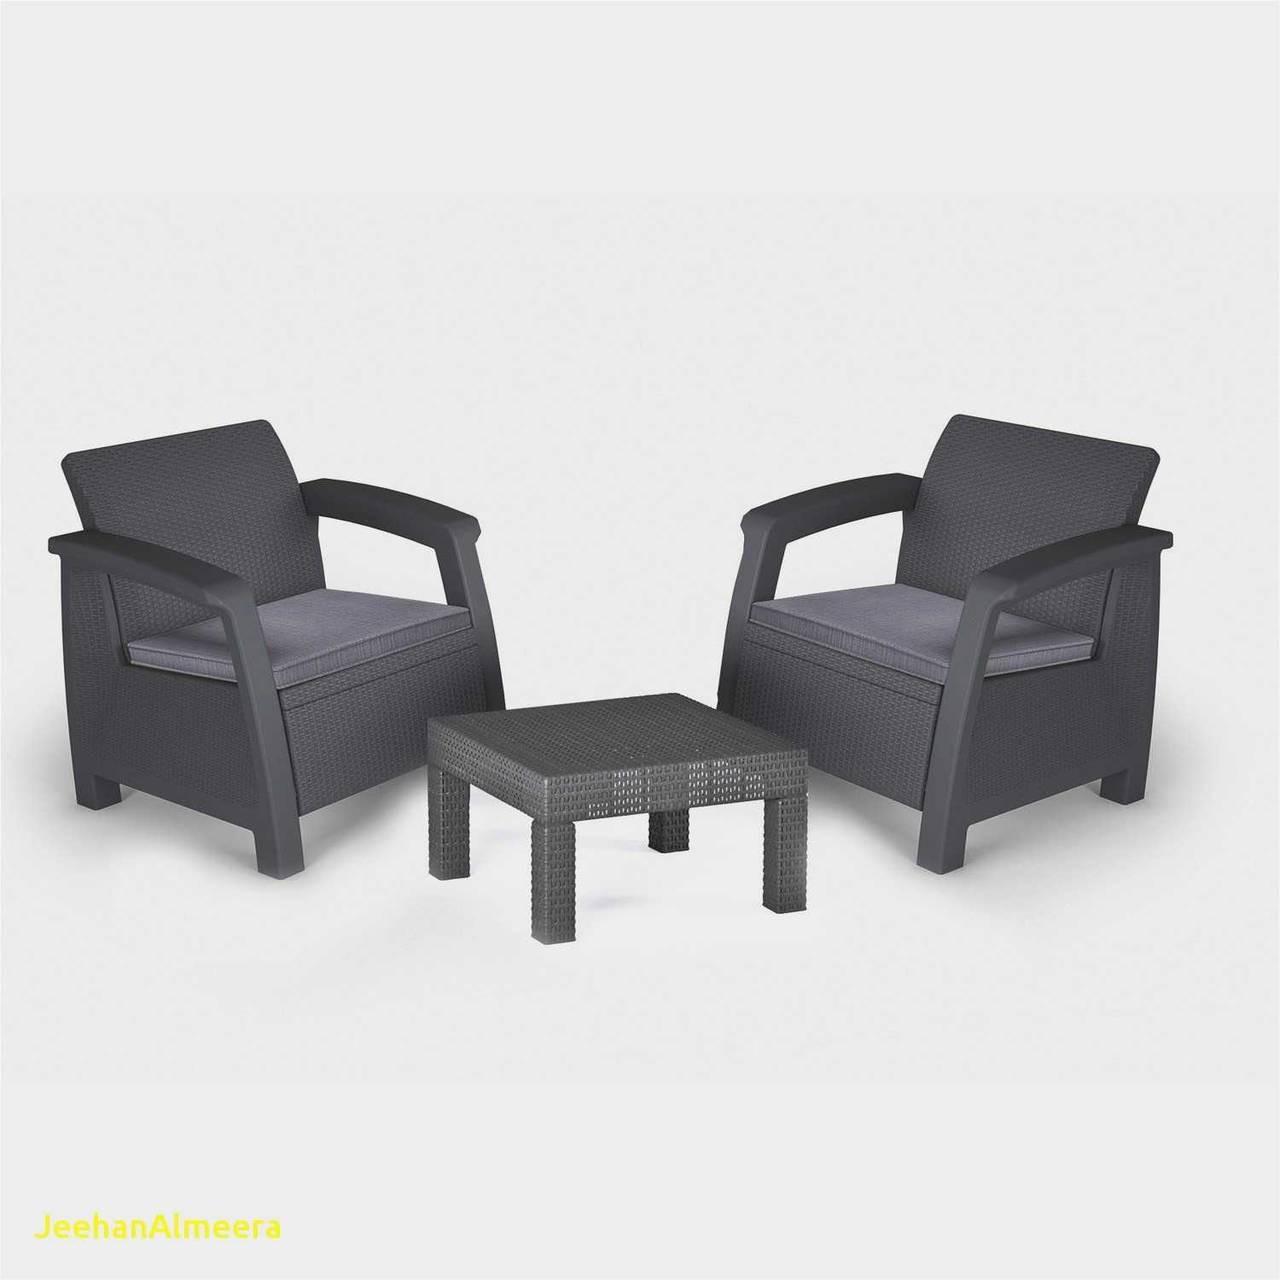 meubles de jardin design meilleurs sites meubles design de luxes chaise de jardin design of meubles de jardin design